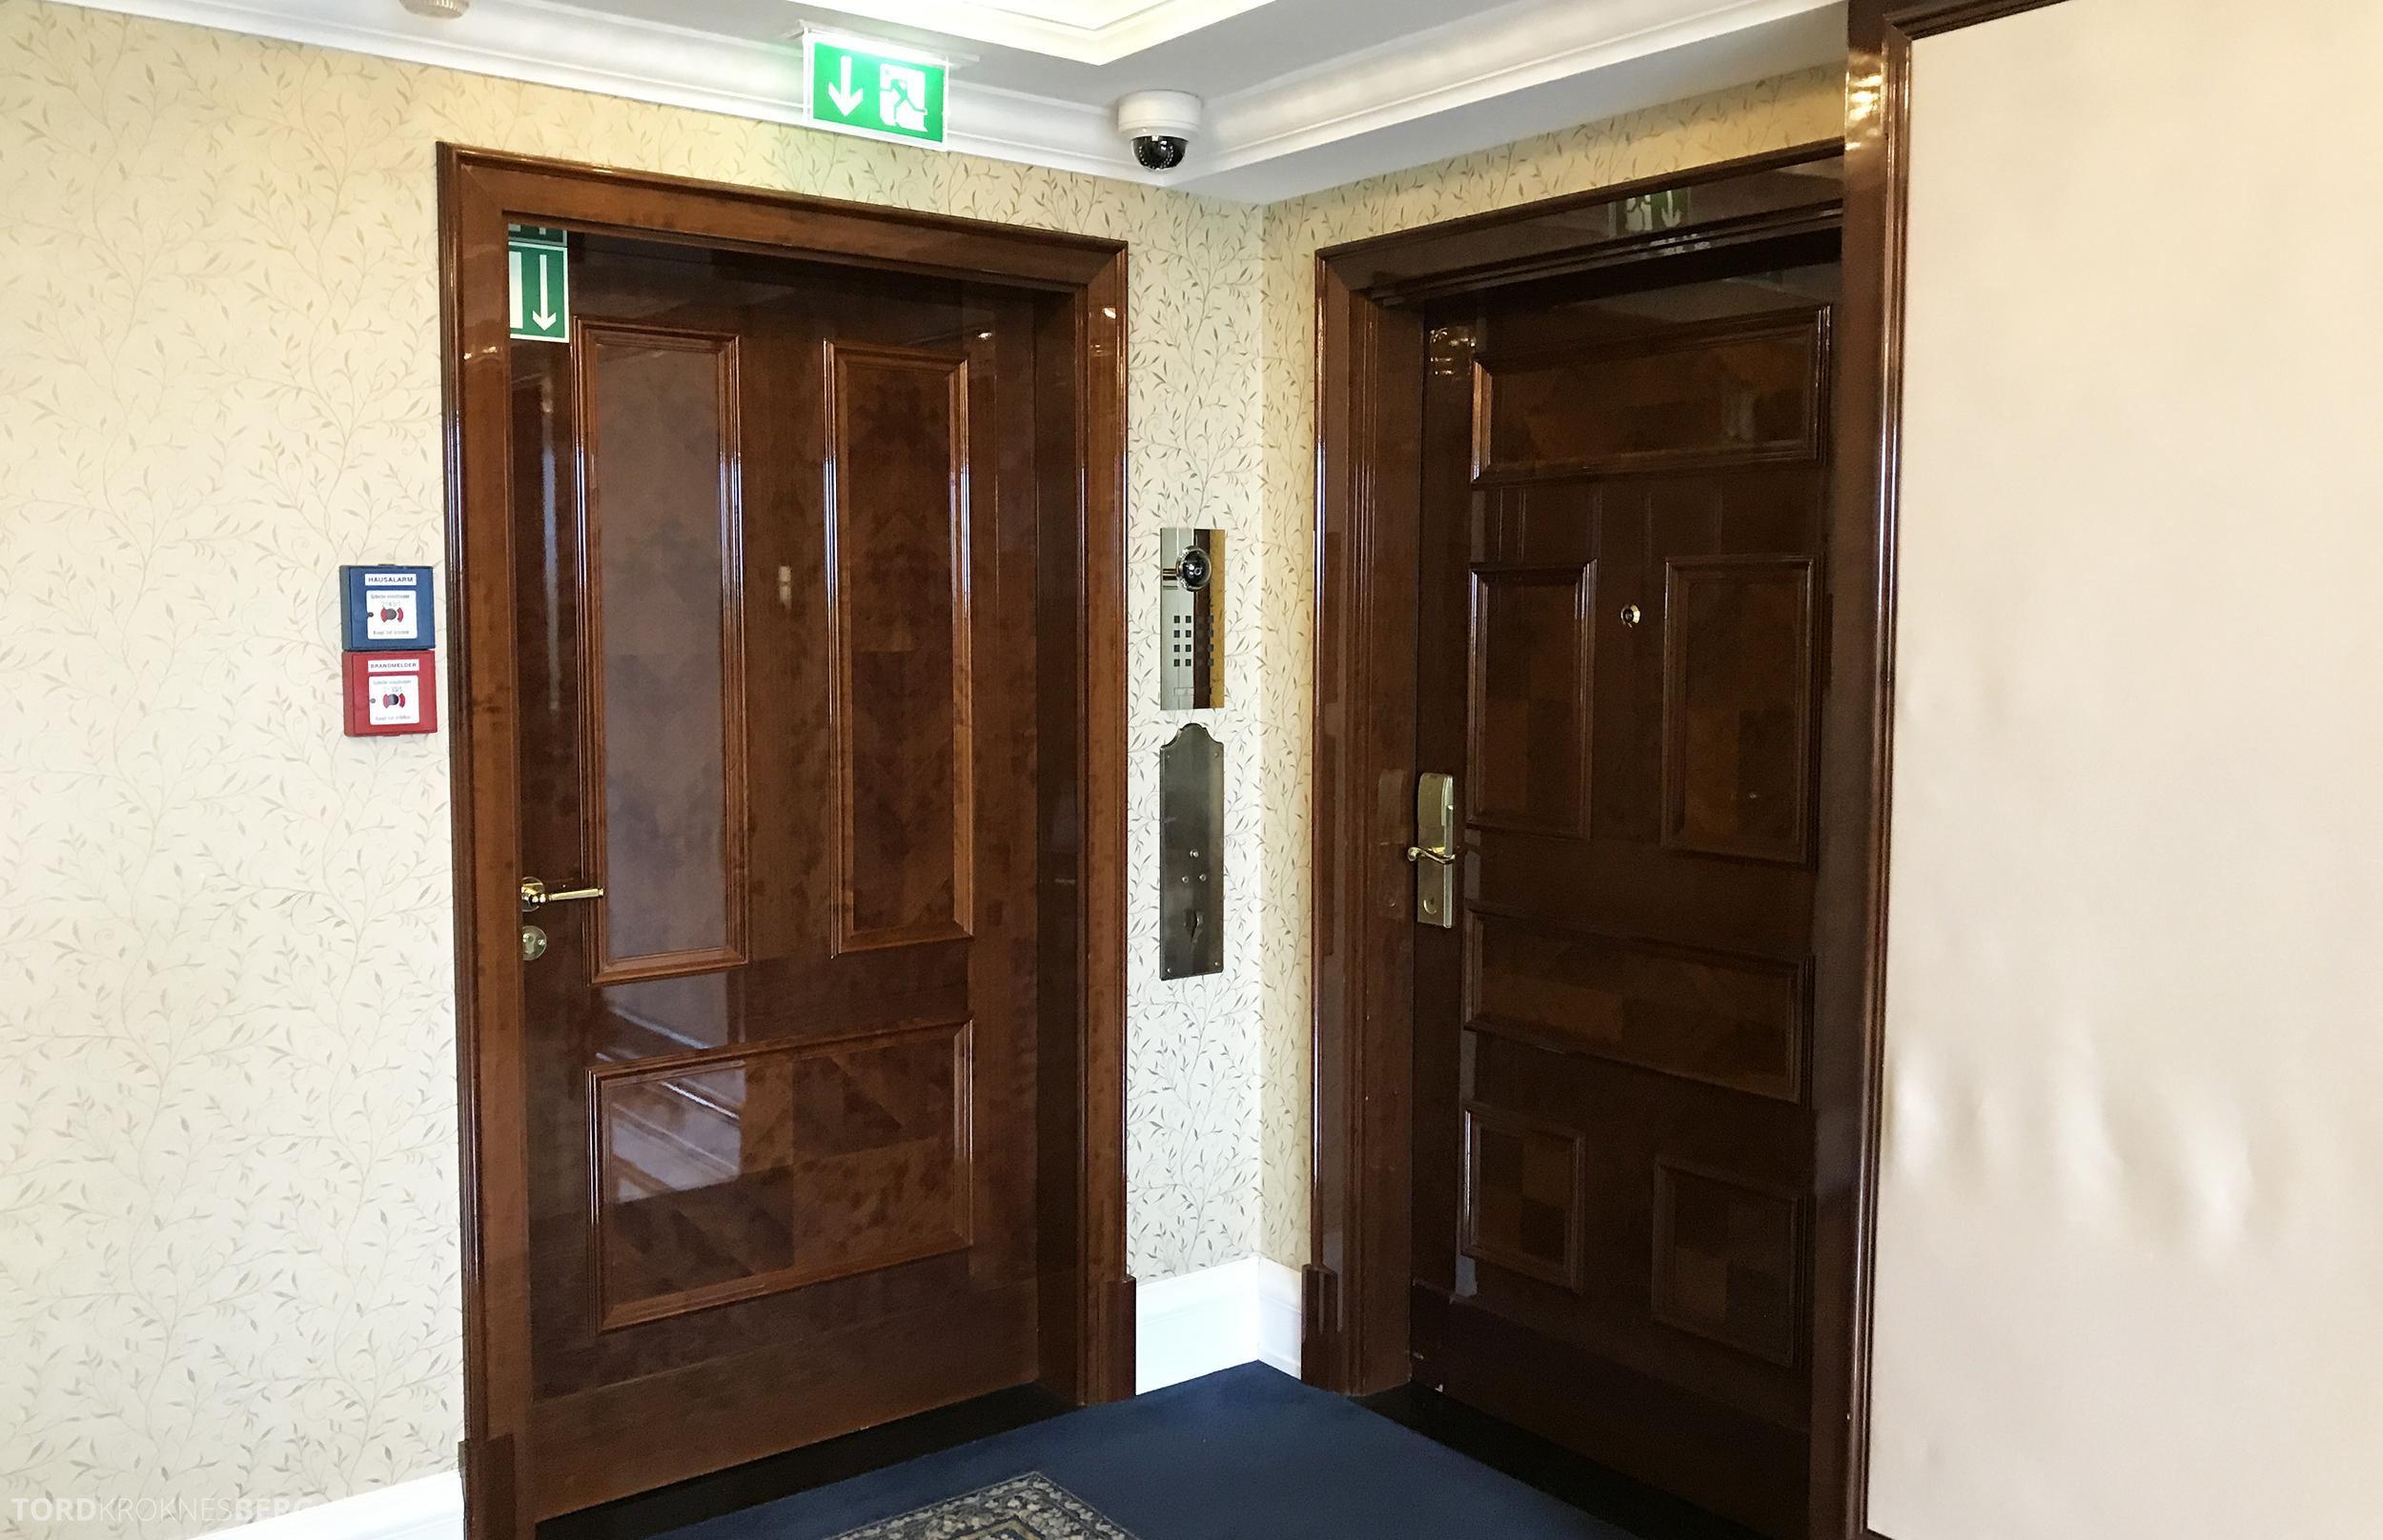 Ritz-Carlton Berlin Presidential Suite dør